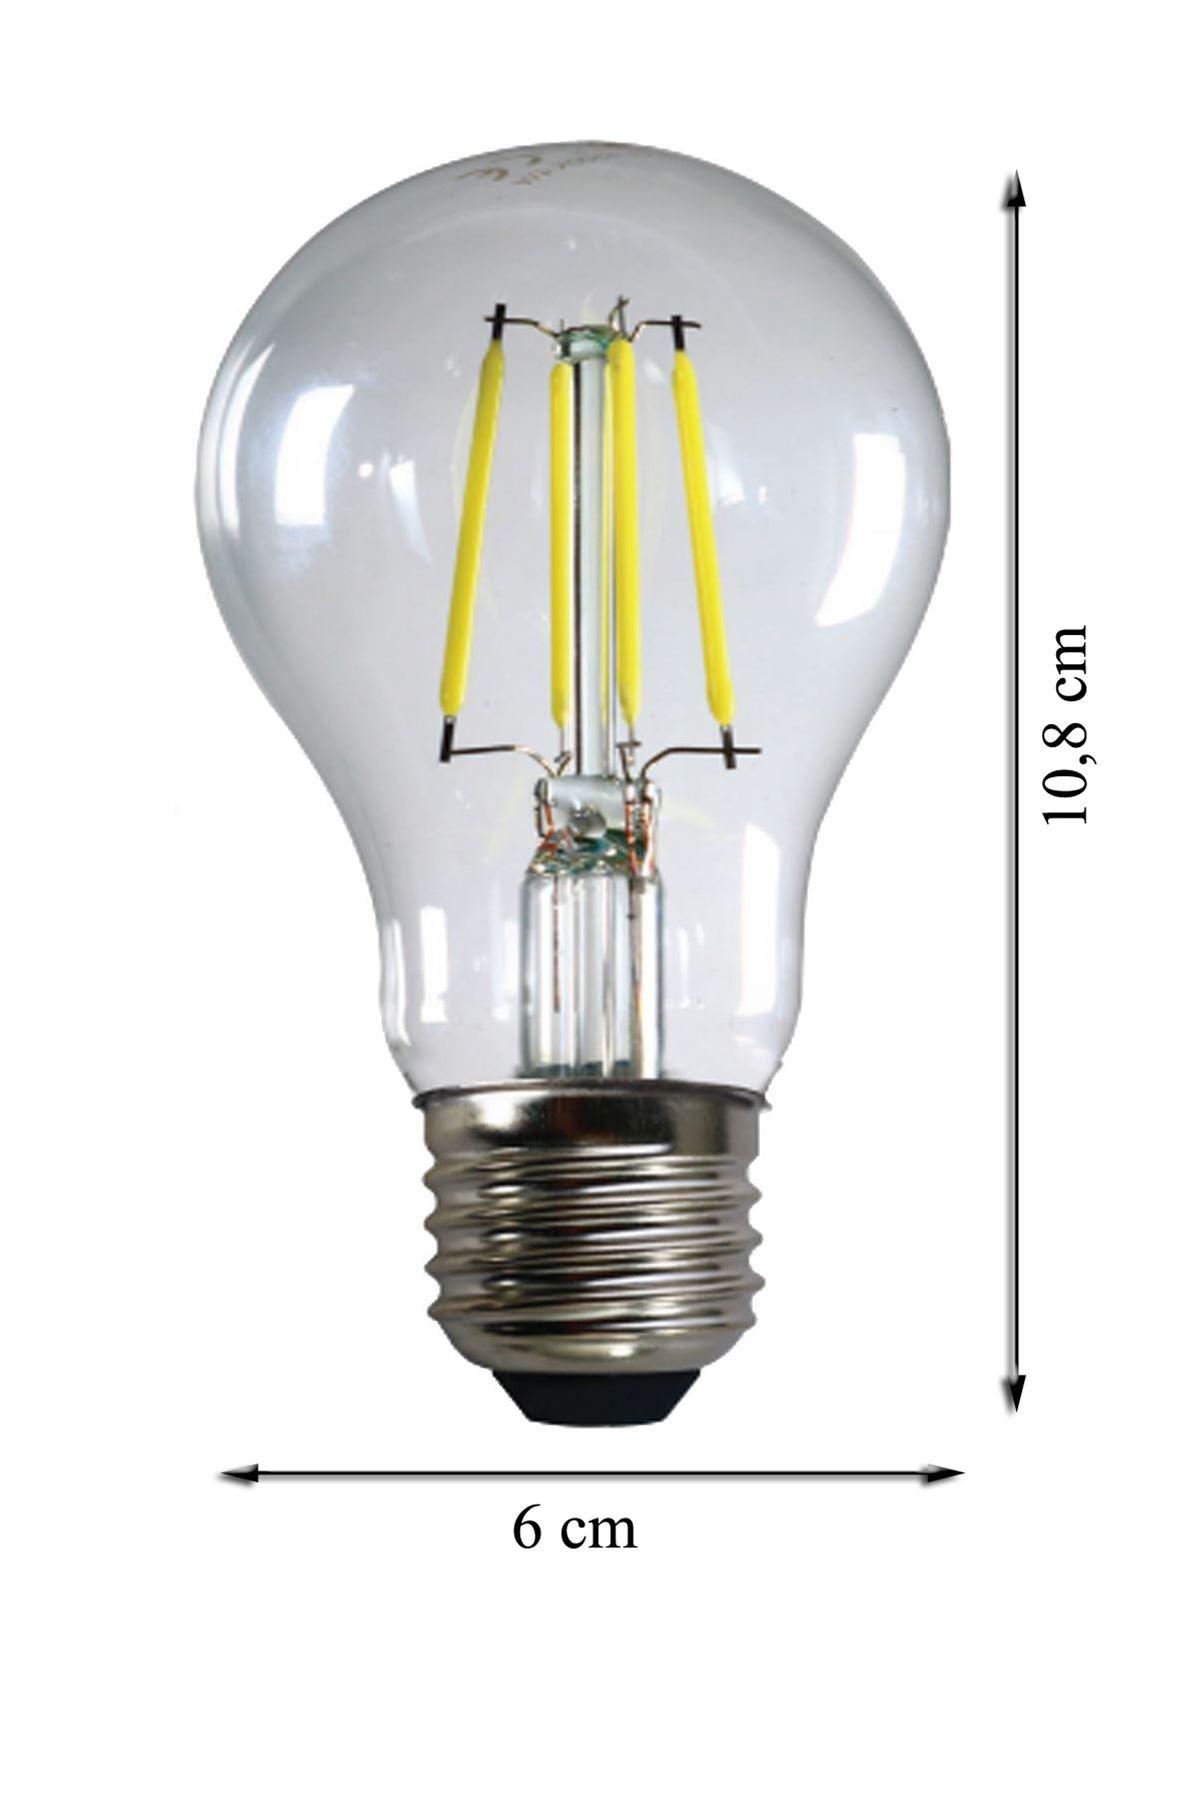 HEKA  E27  6 Watt Beyaz Işık Standart Tip Filament Edison Tip Rustik LED Ampül